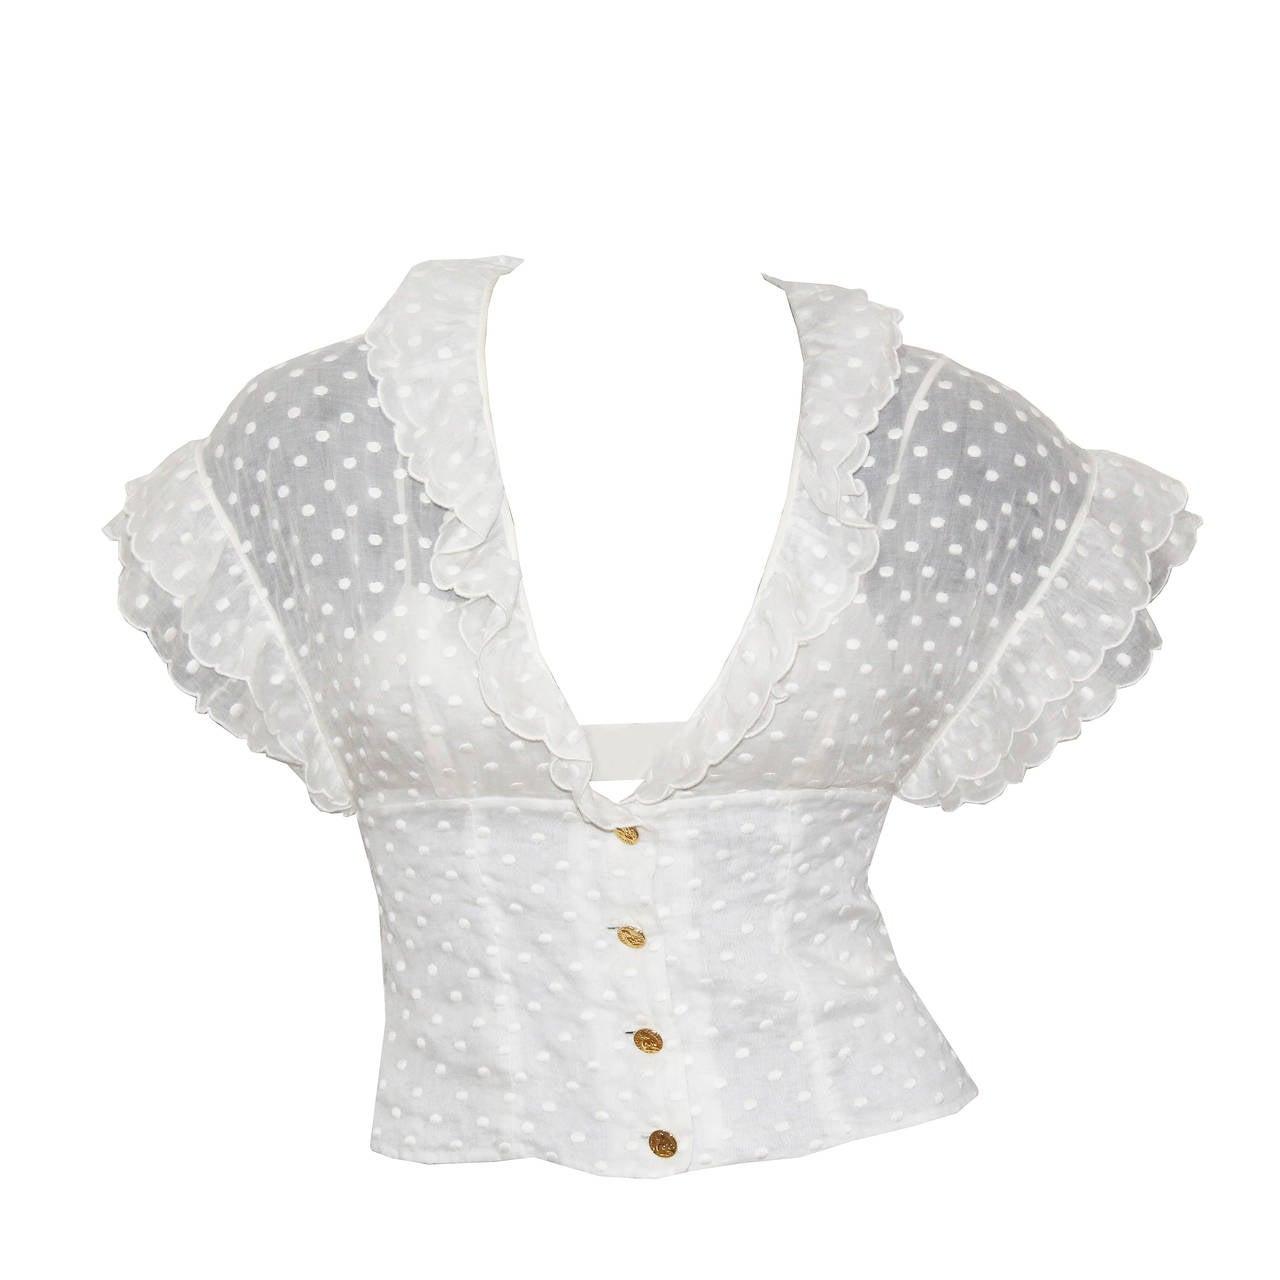 1980s Chanel polkadot ruffle summer blouse For Sale